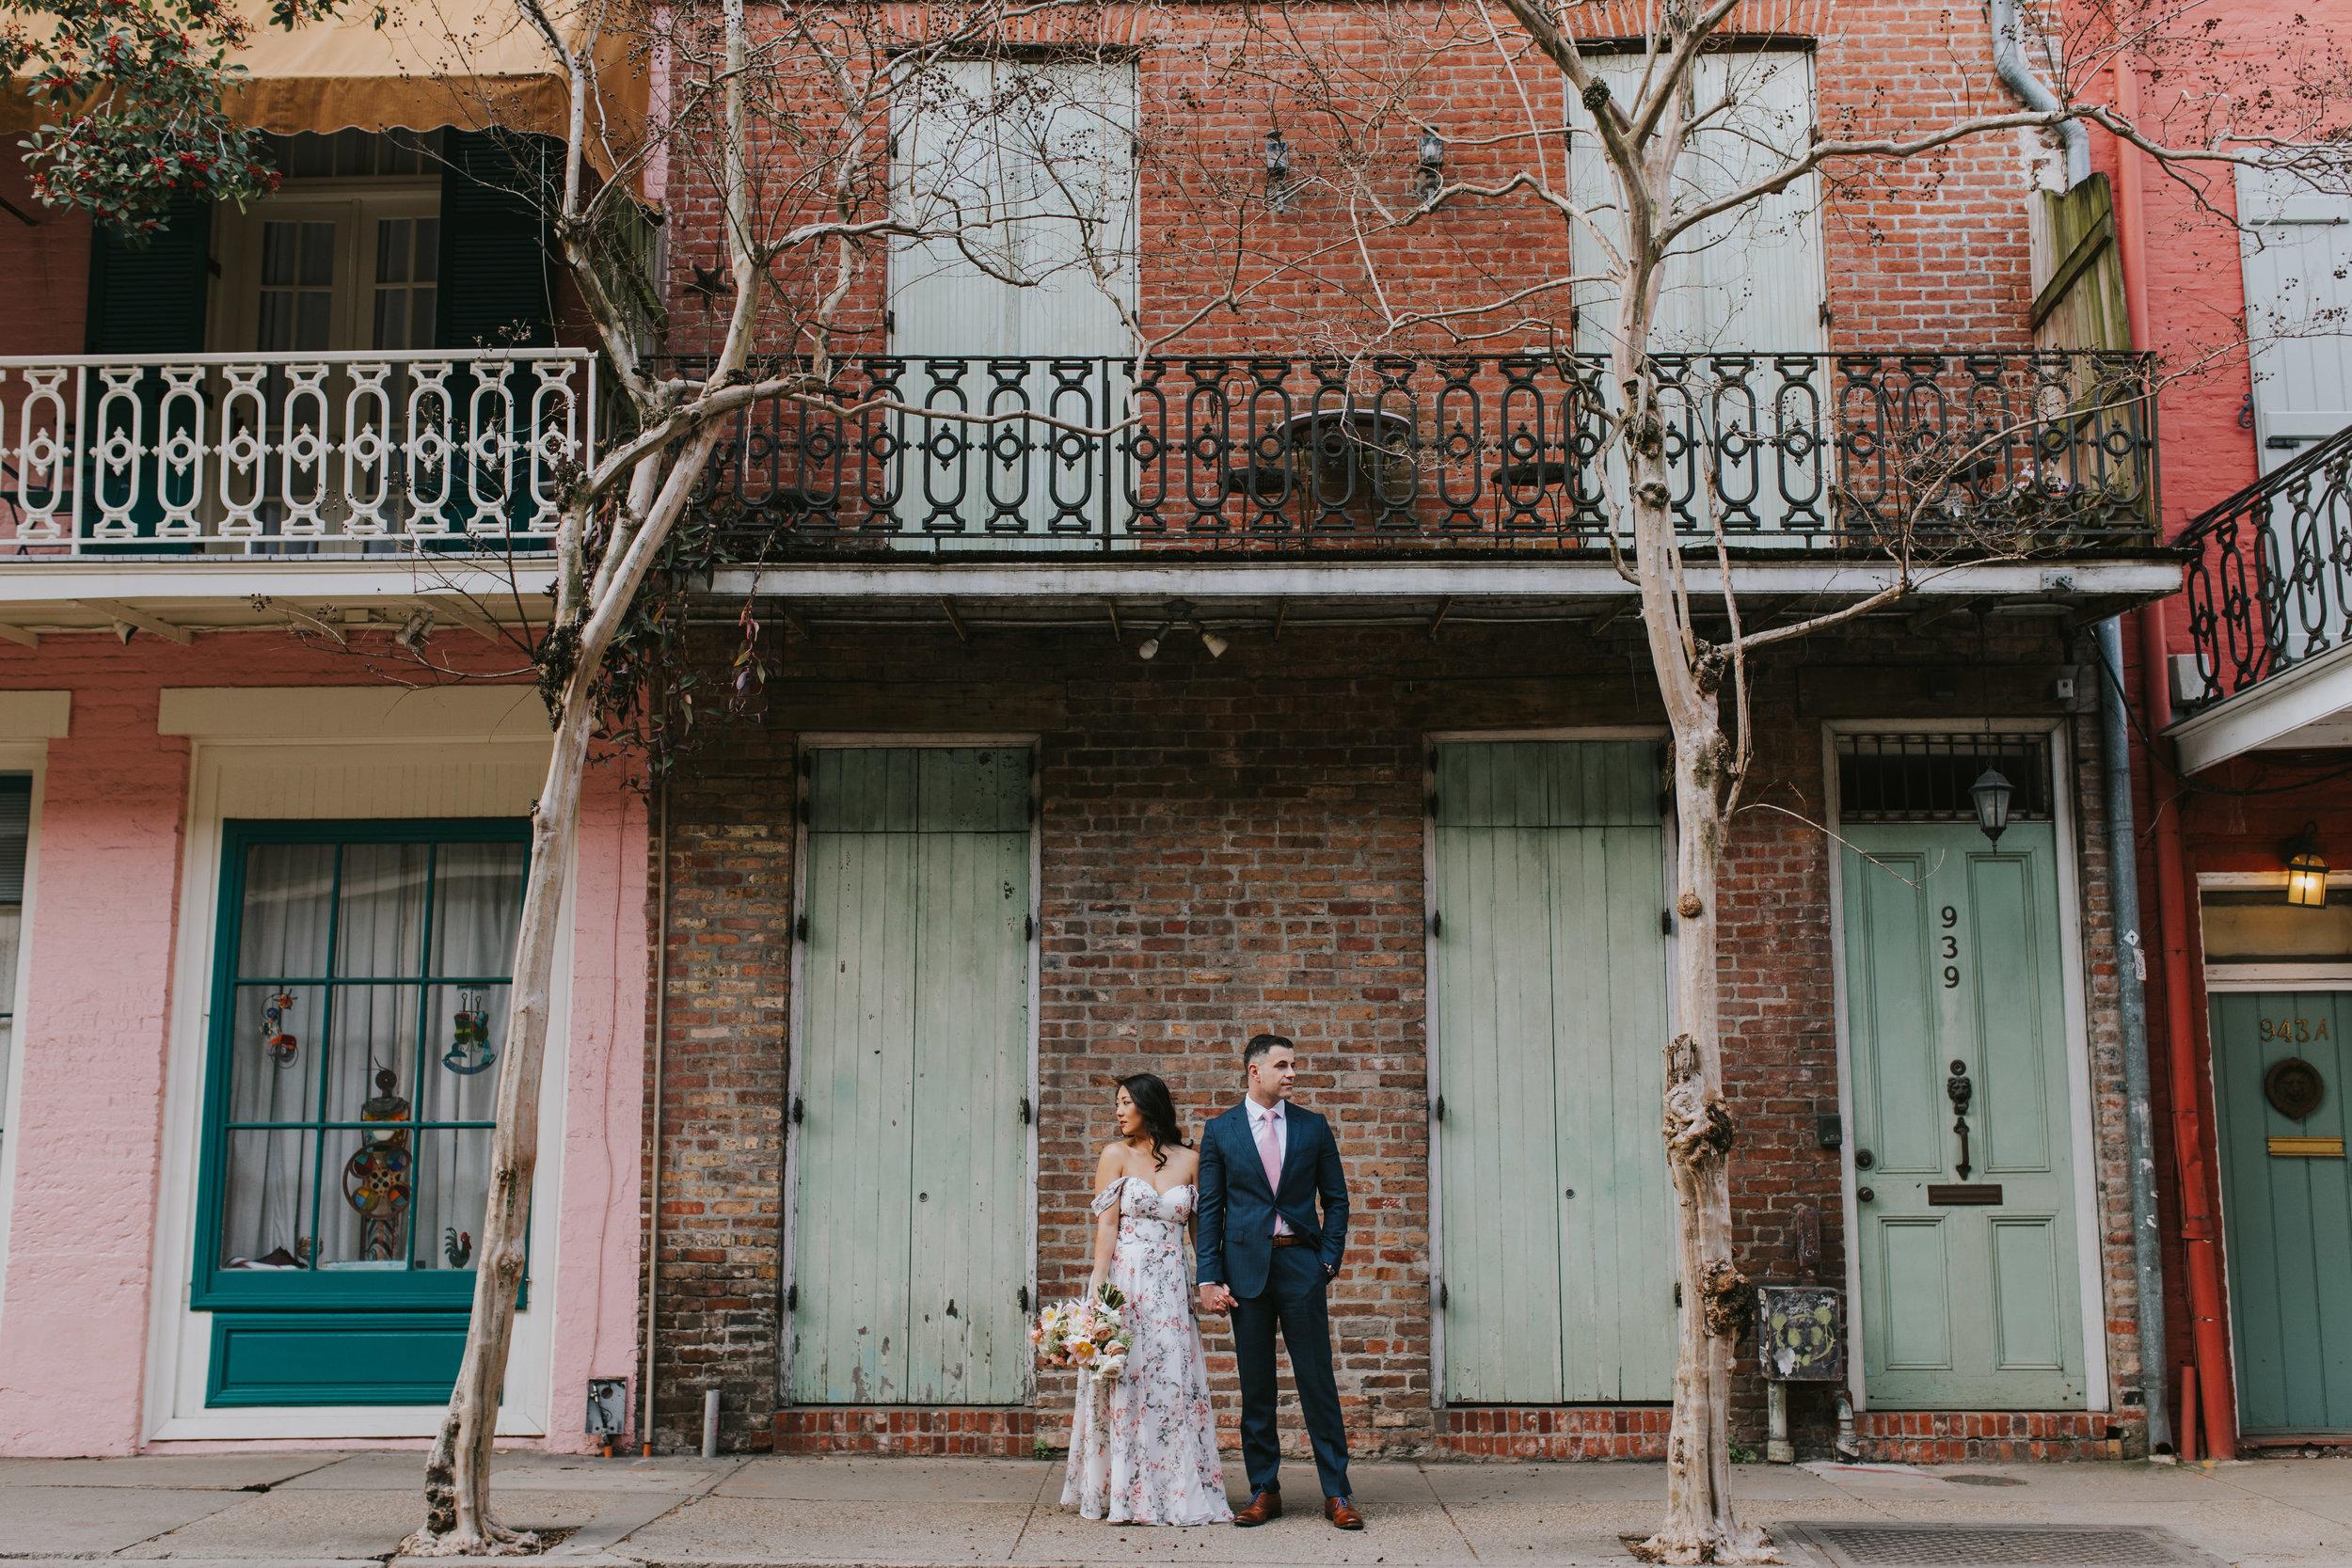 French Quarter Elopement New Orleans Wedding Photographer Ashley Biltz Photography13.jpg